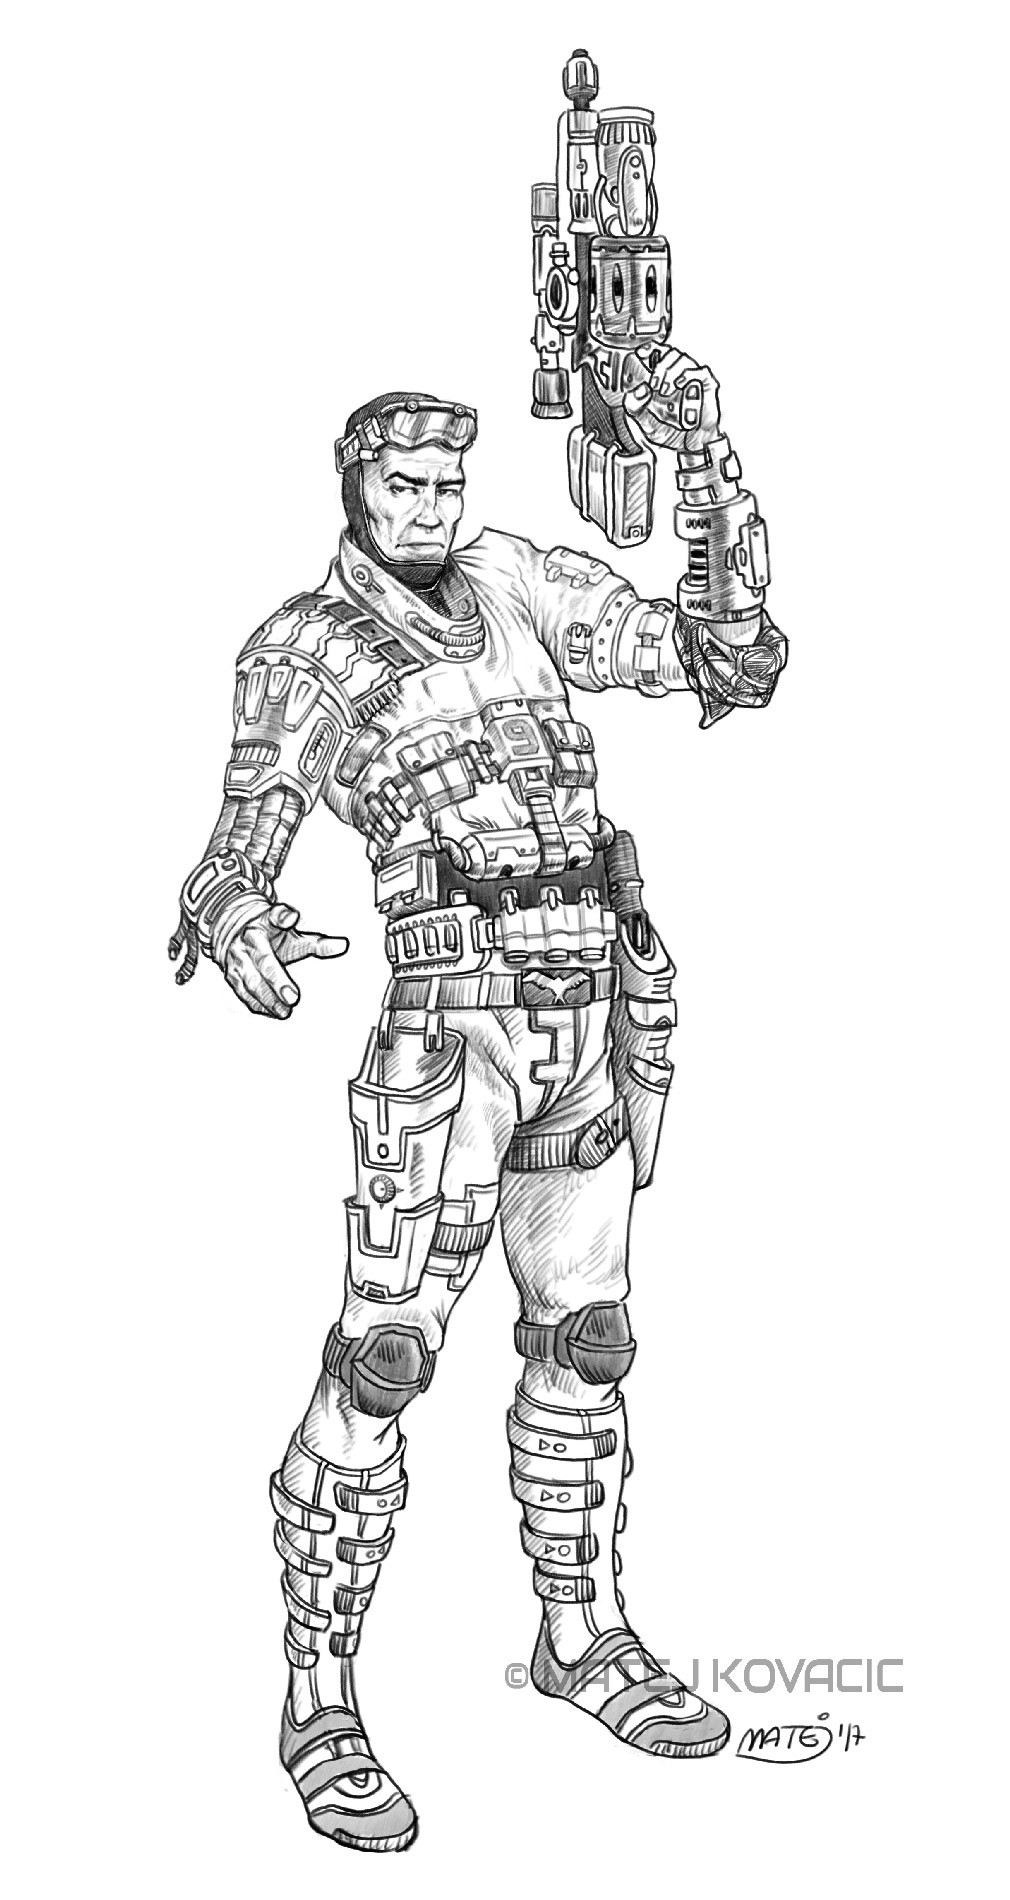 Matej kovacic sci fi soldier by matej kovacic